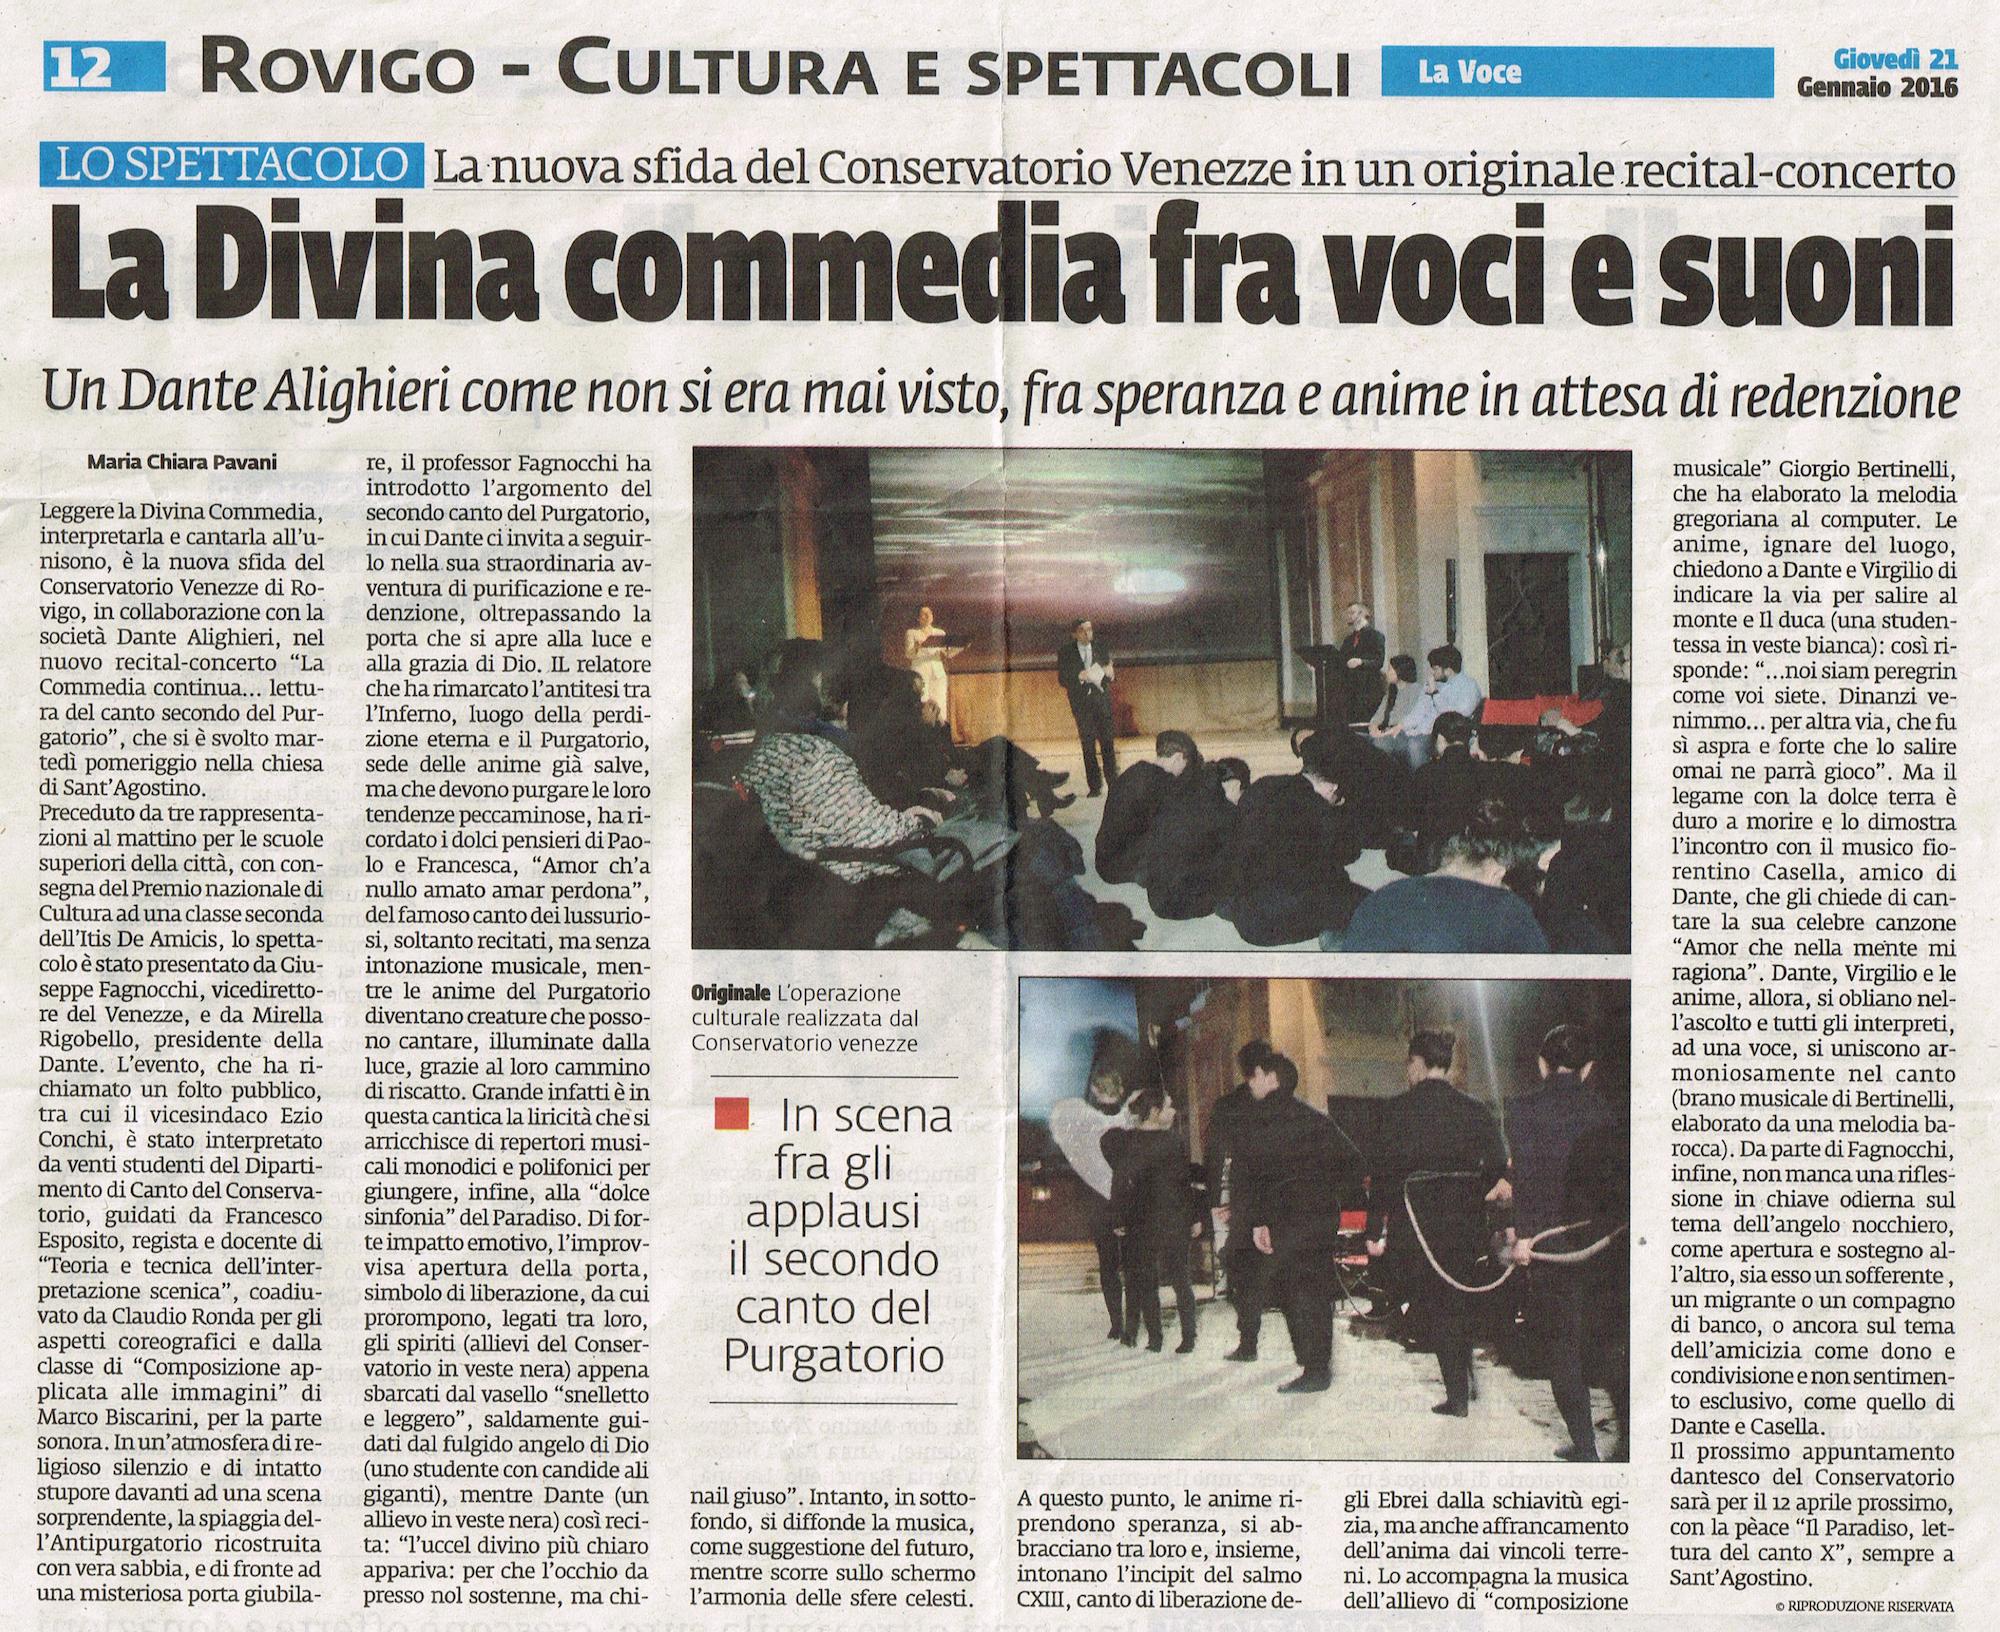 divina commedia_la voce_rovigo